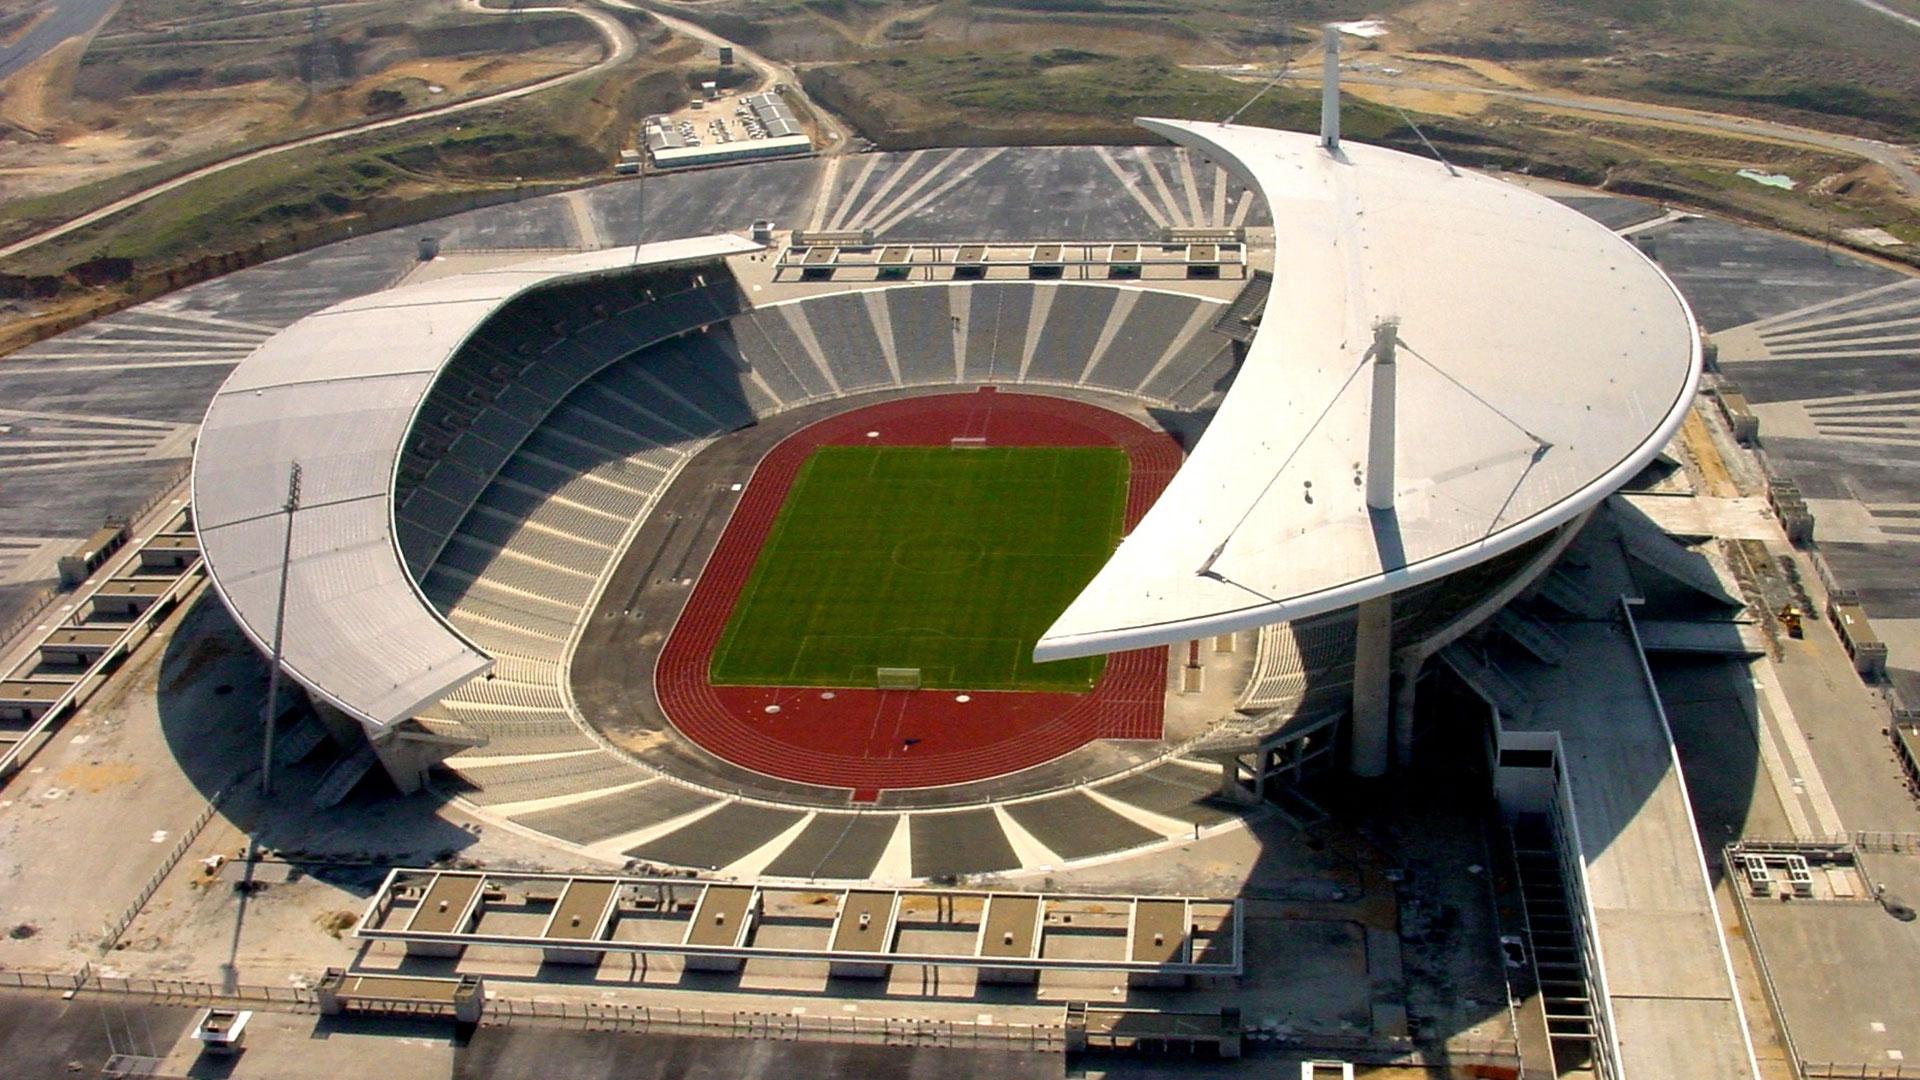 ataturk olympic stadium 01312020 fhwvd6p991qz2qvap9gghd9